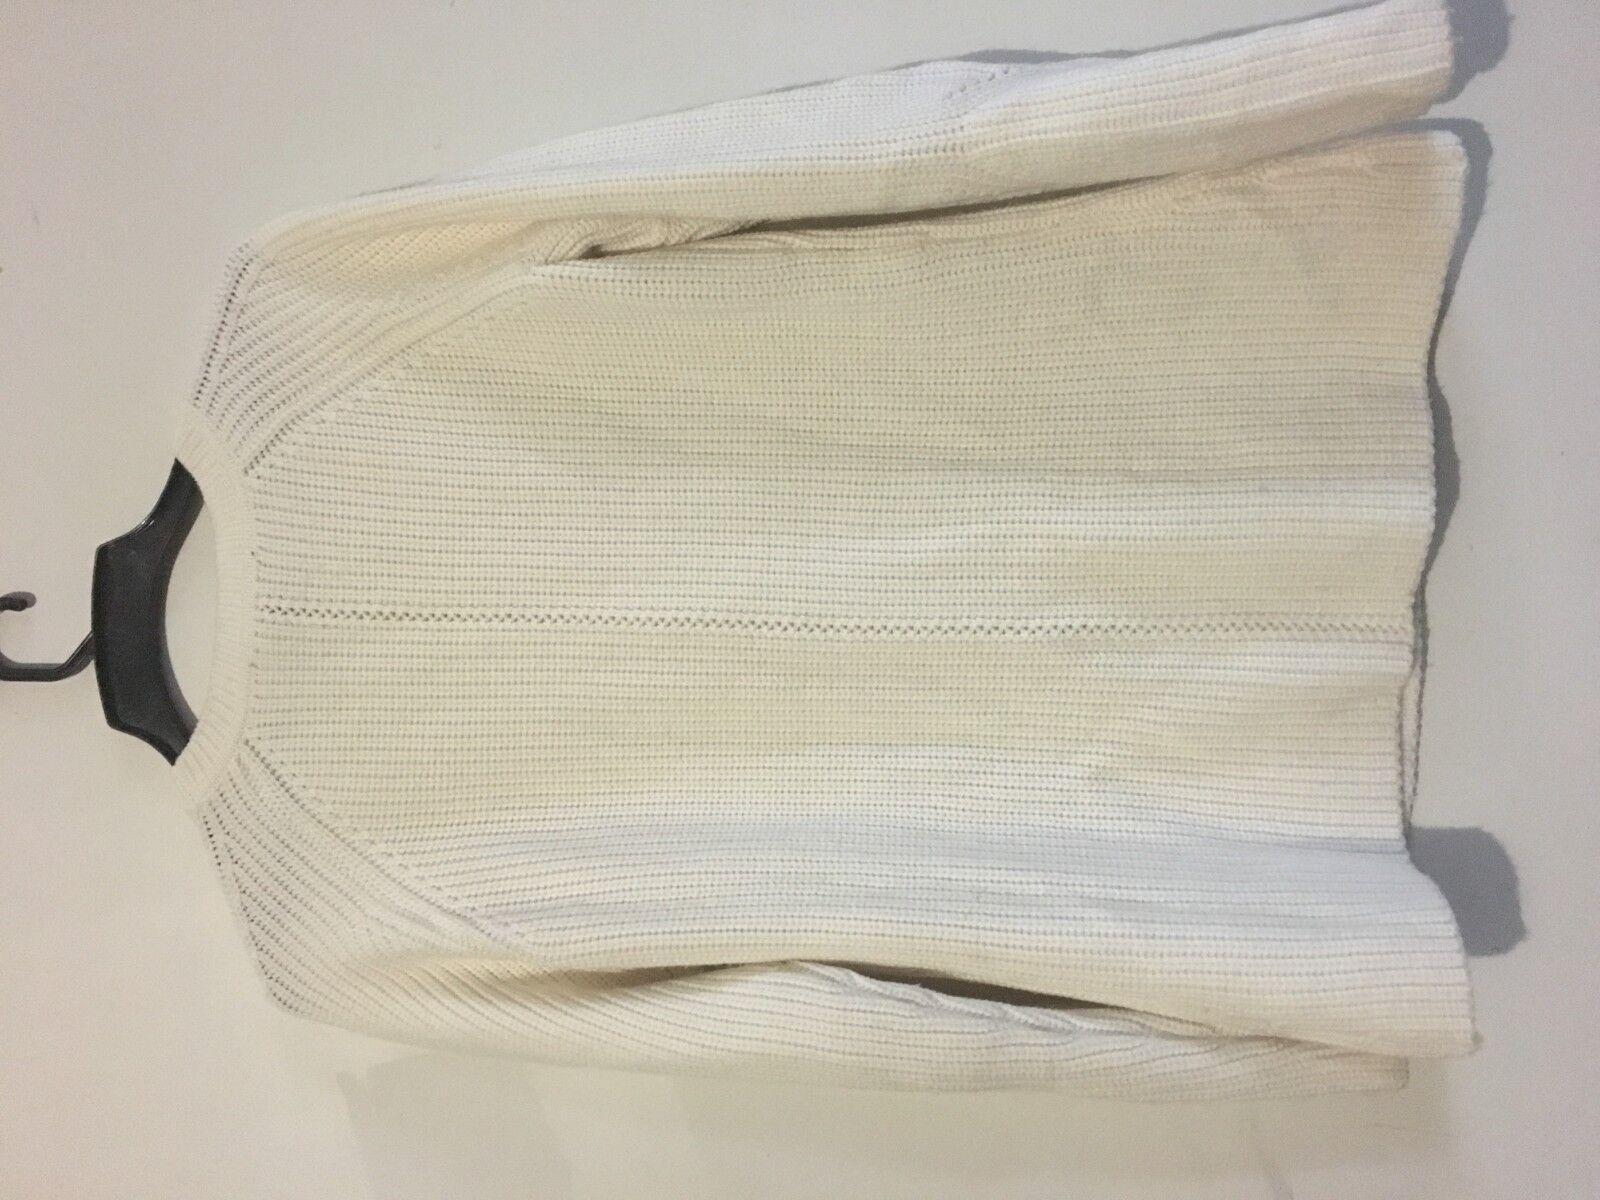 Etcetera Wool Wool Wool Blend Cream Knit Cable Size M Women Stylish Sweater ea87c3